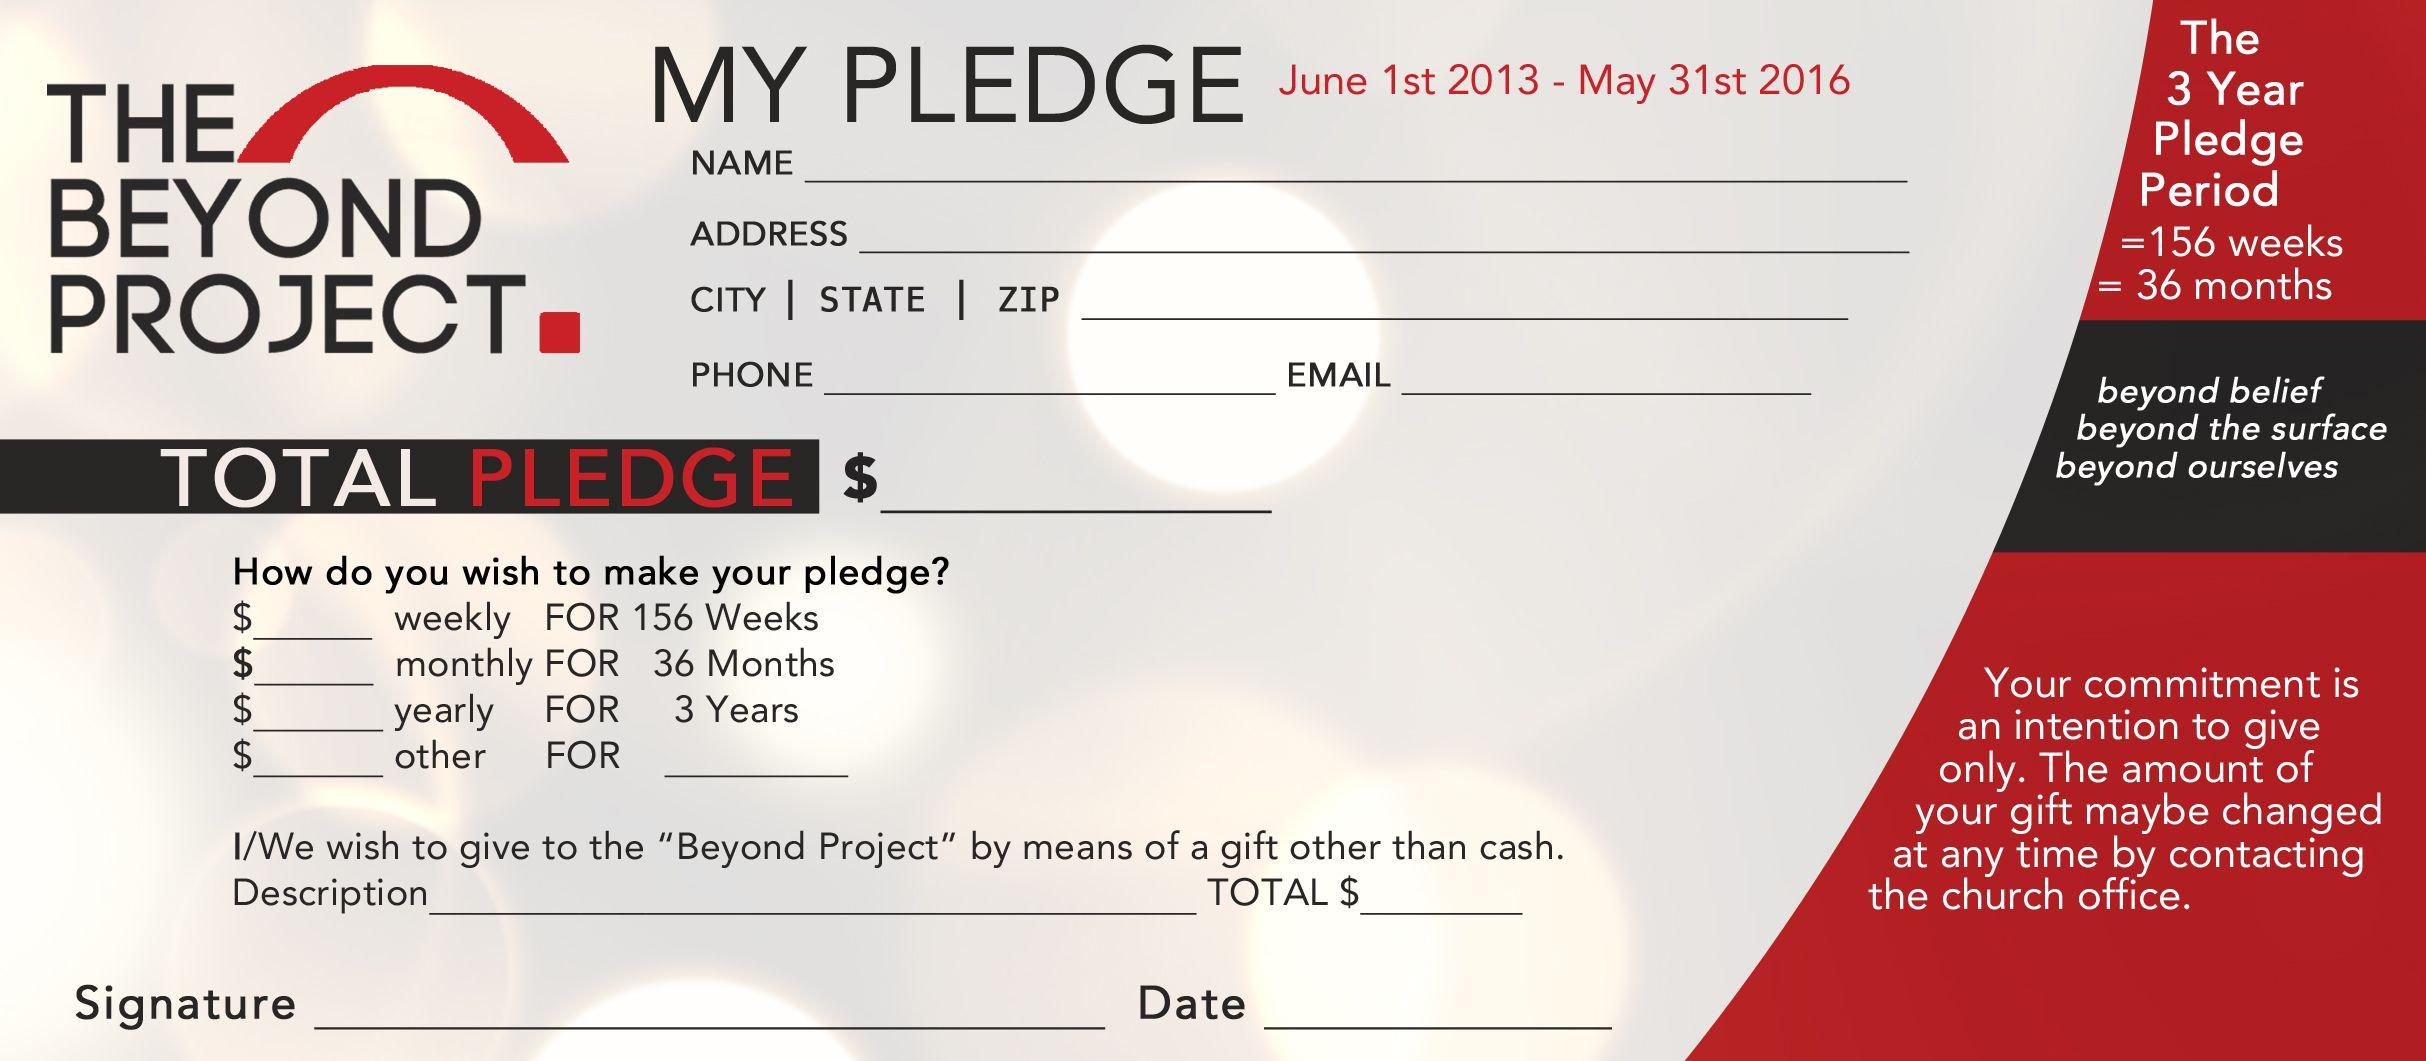 Church Pledge Form Template Hausn3Uc   Capital Campaign With Regard To Pledge Card Template For Church